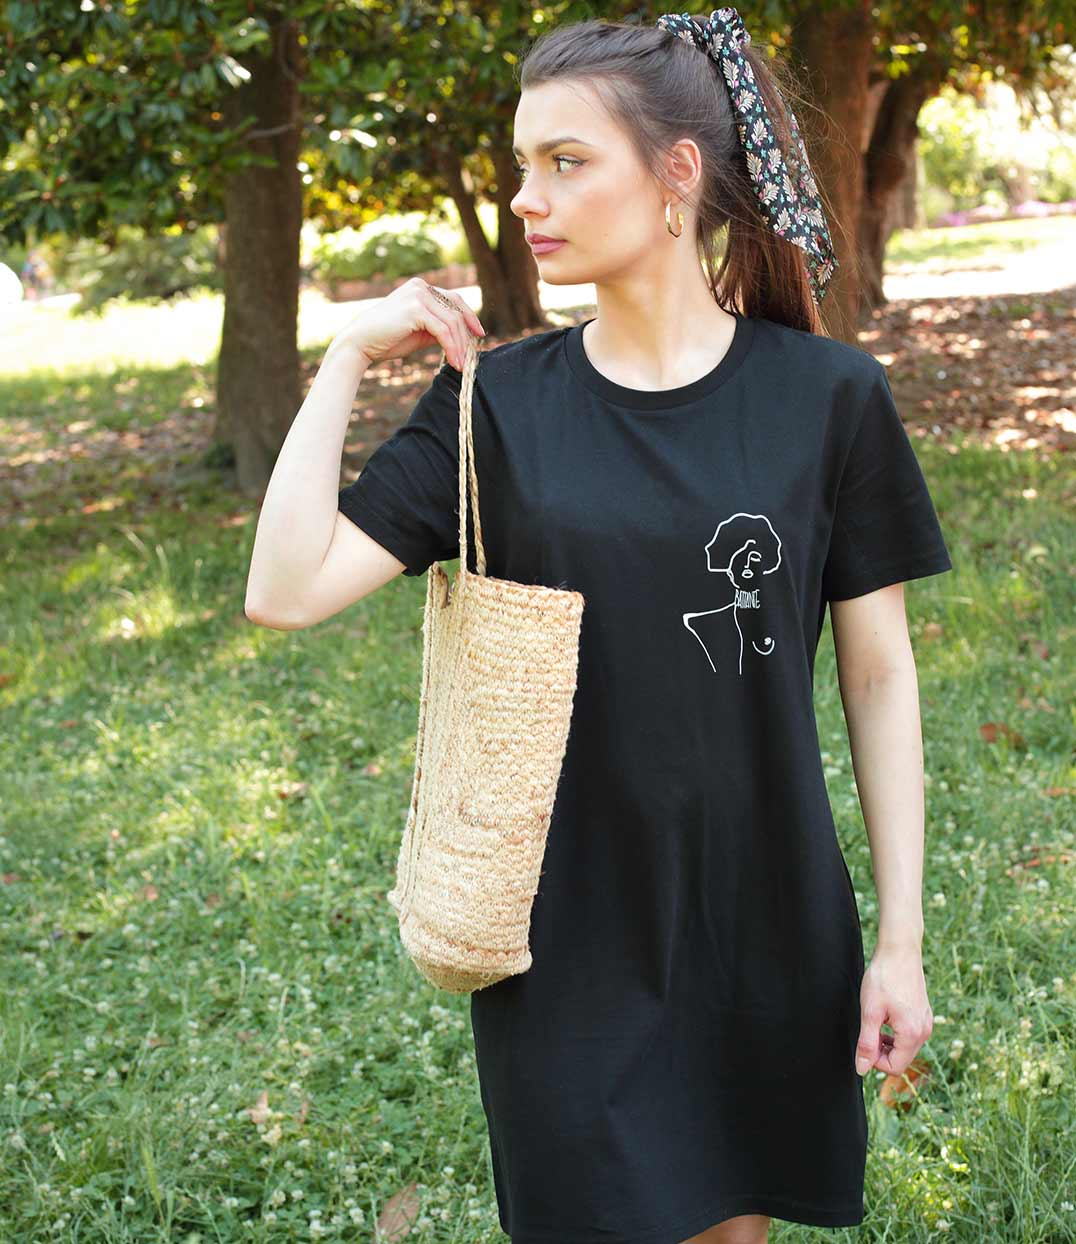 femme qui porte une robe noir klimt leonor roversi